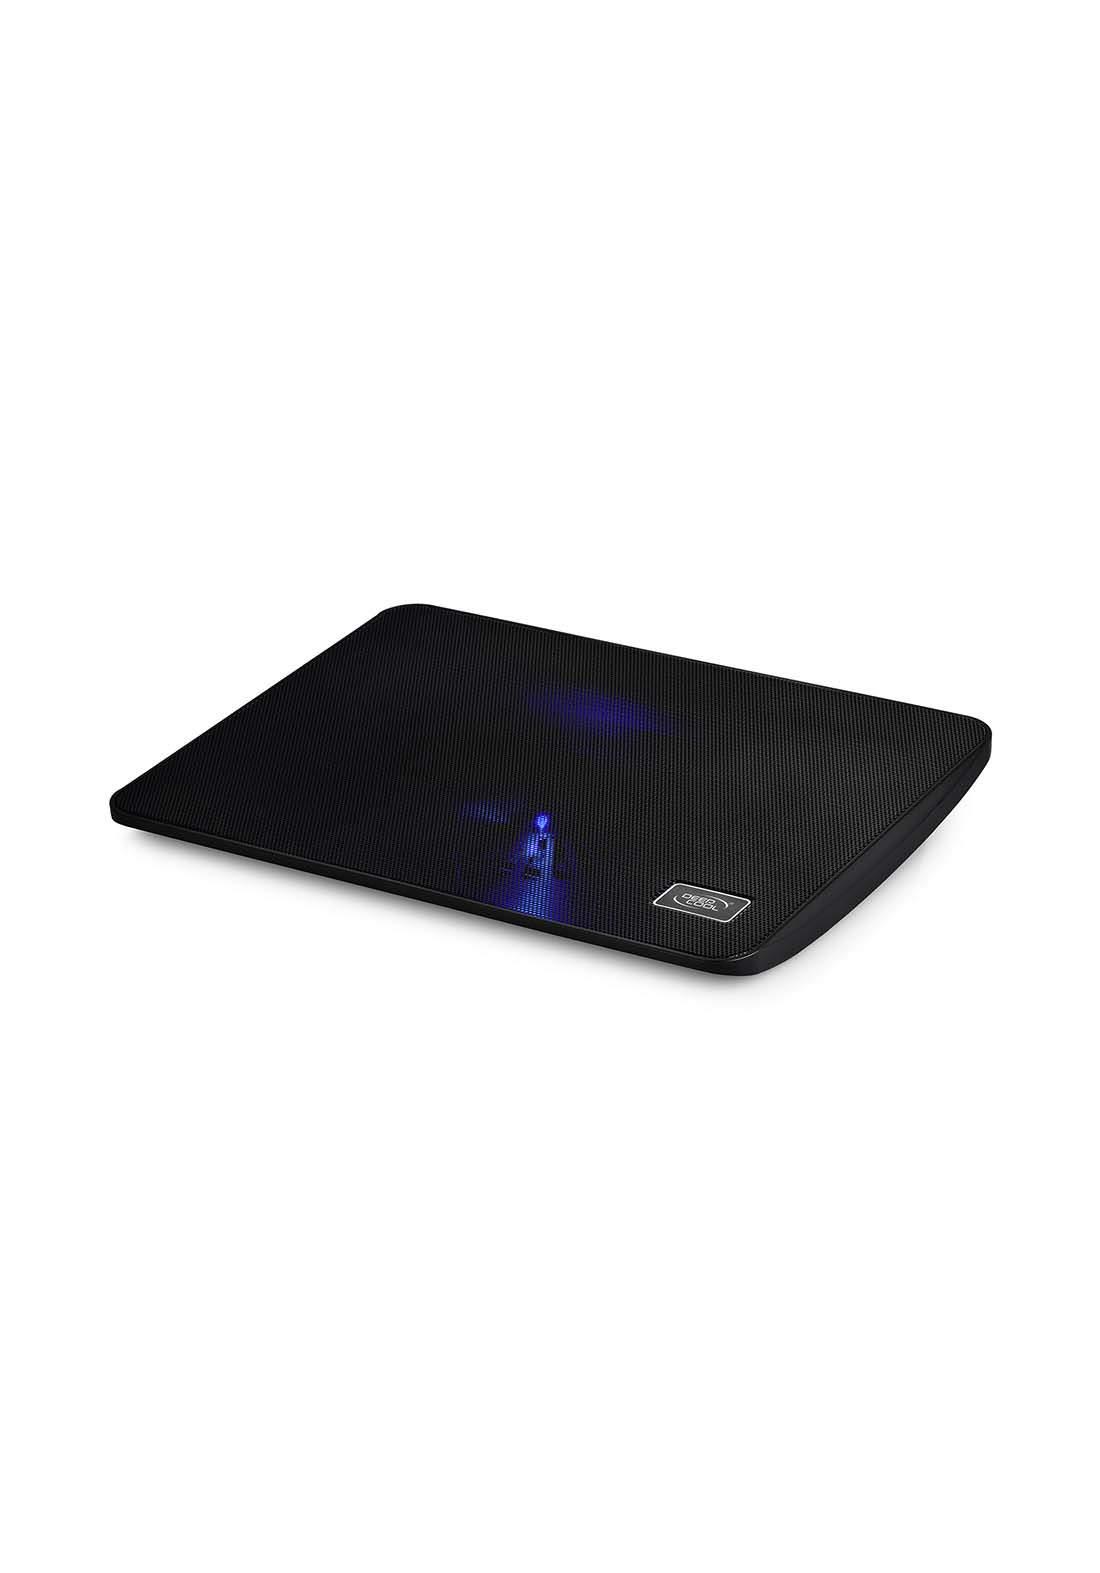 DeepCool Mini Cooling Pad Van Laptop - Black